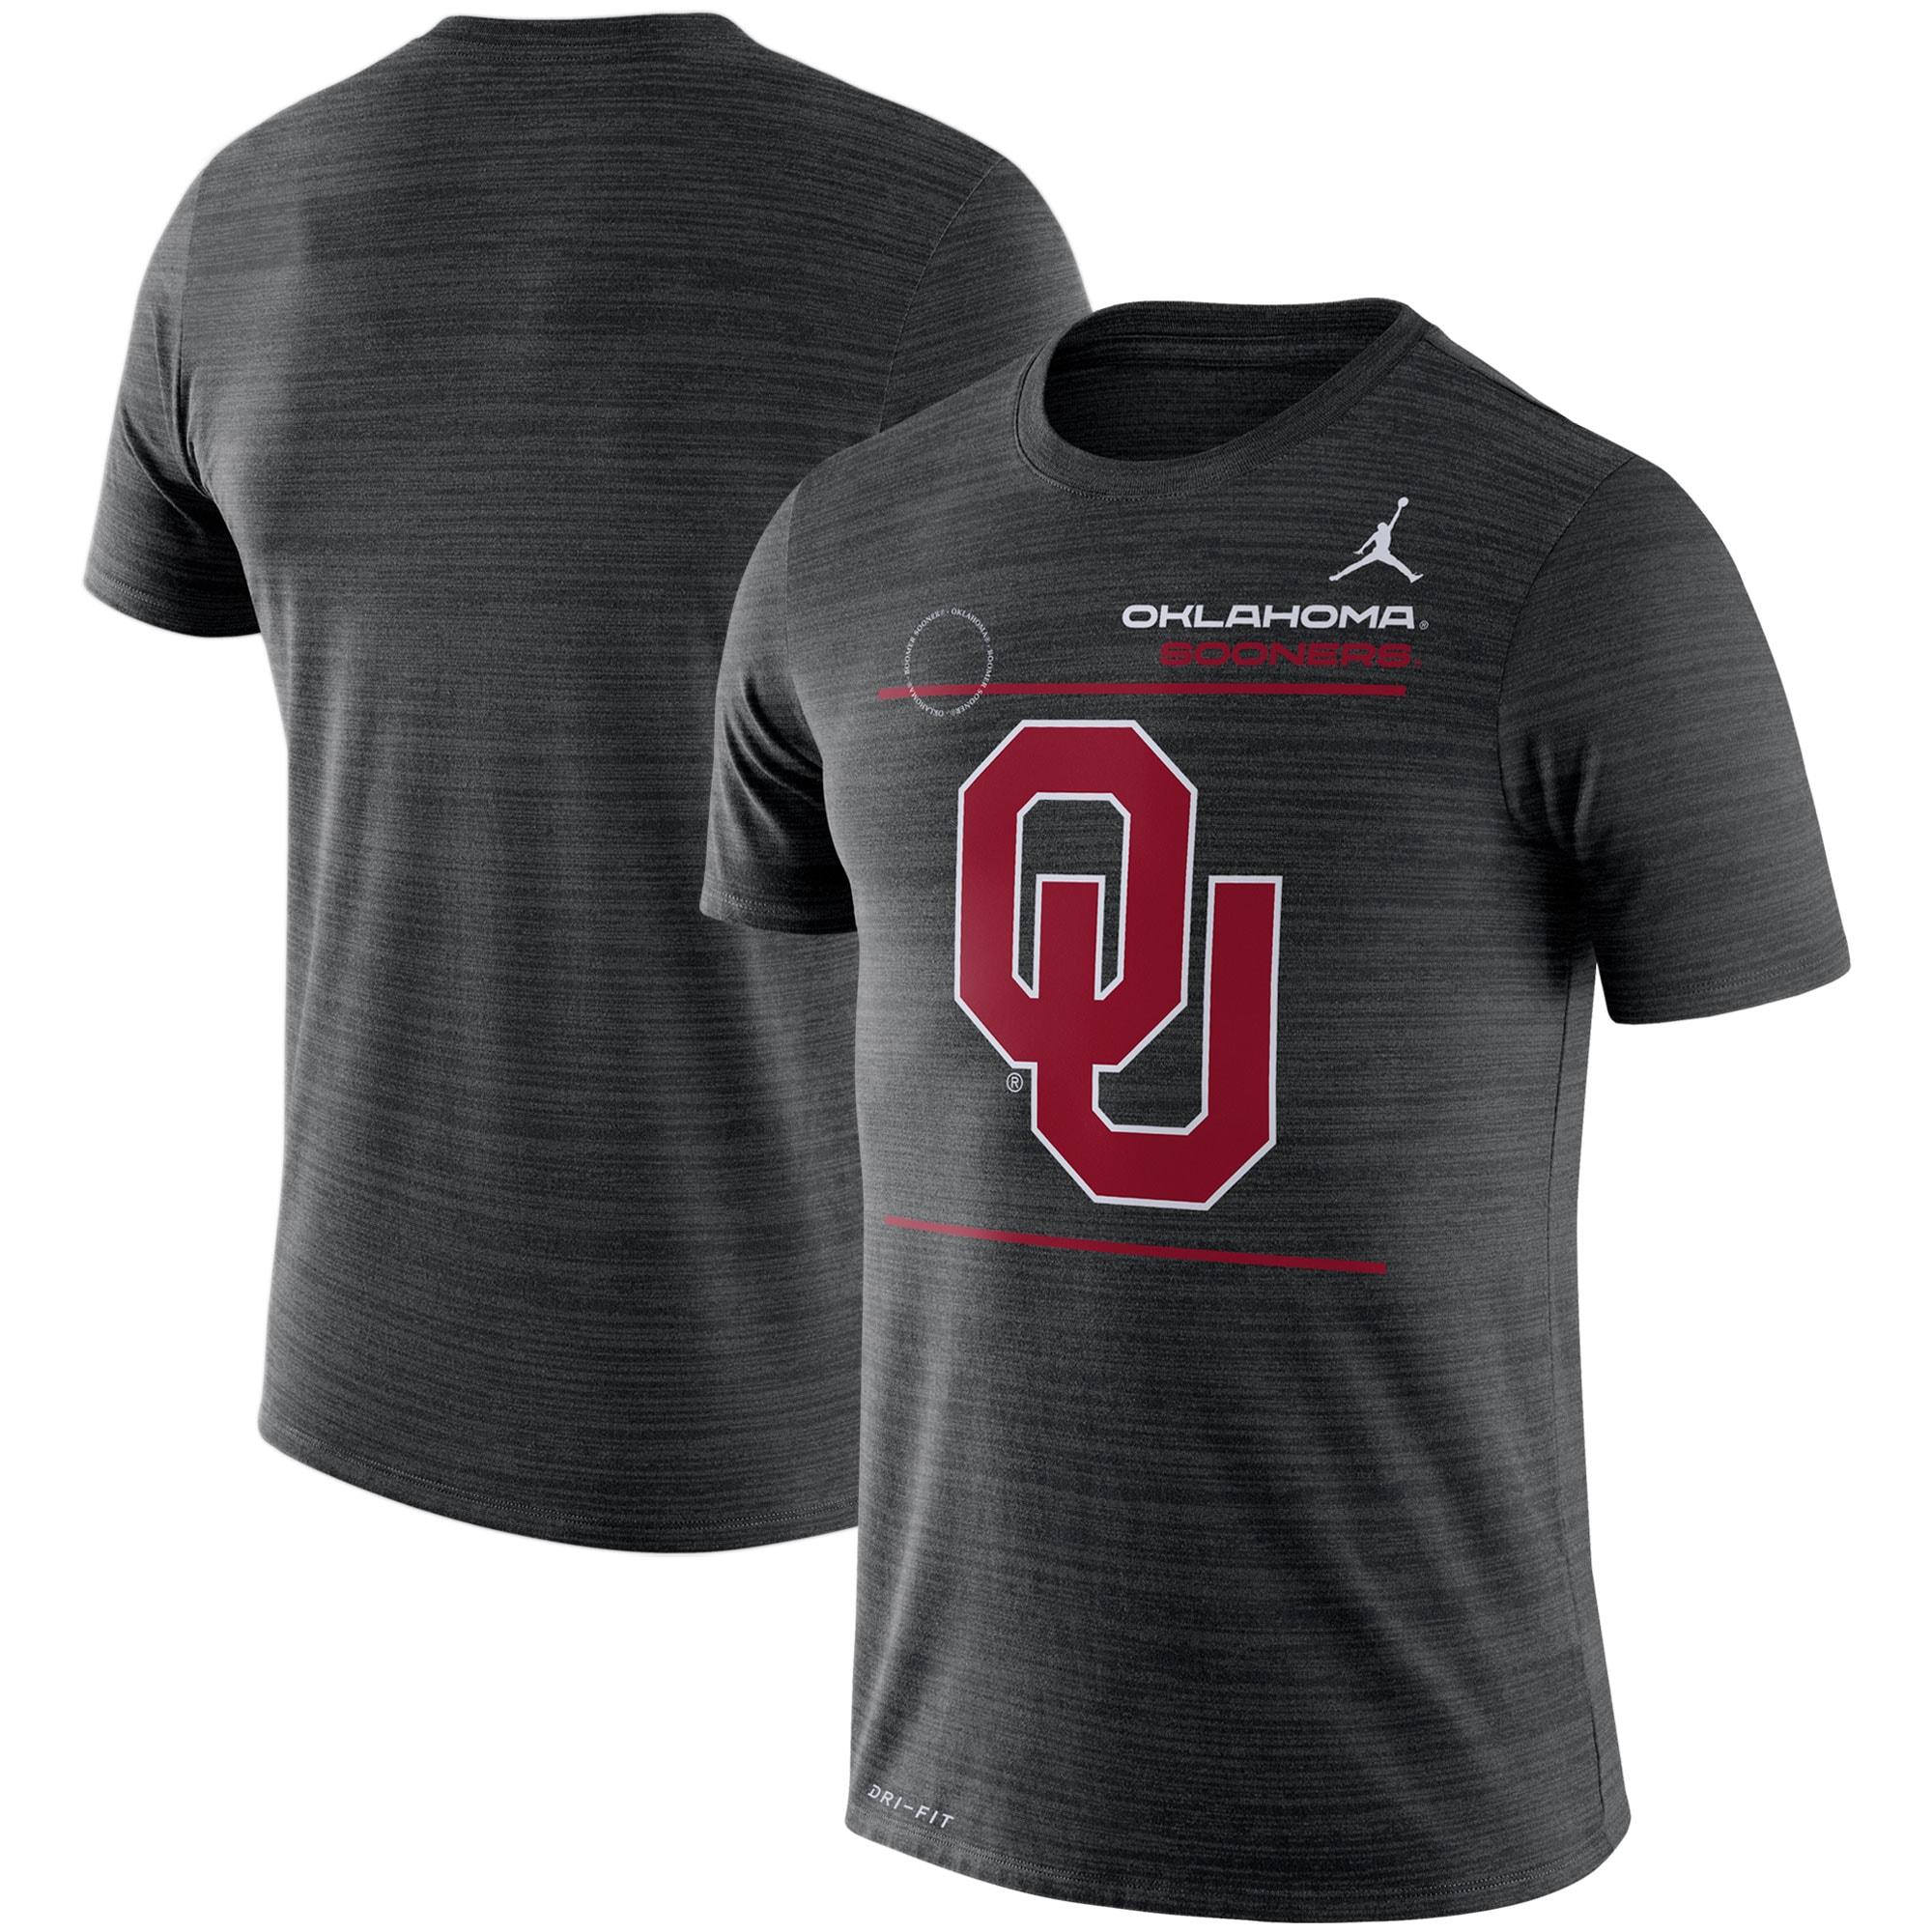 Oklahoma Sooners Jordan Brand 2021 Sideline Velocity Performance T-Shirt - Black